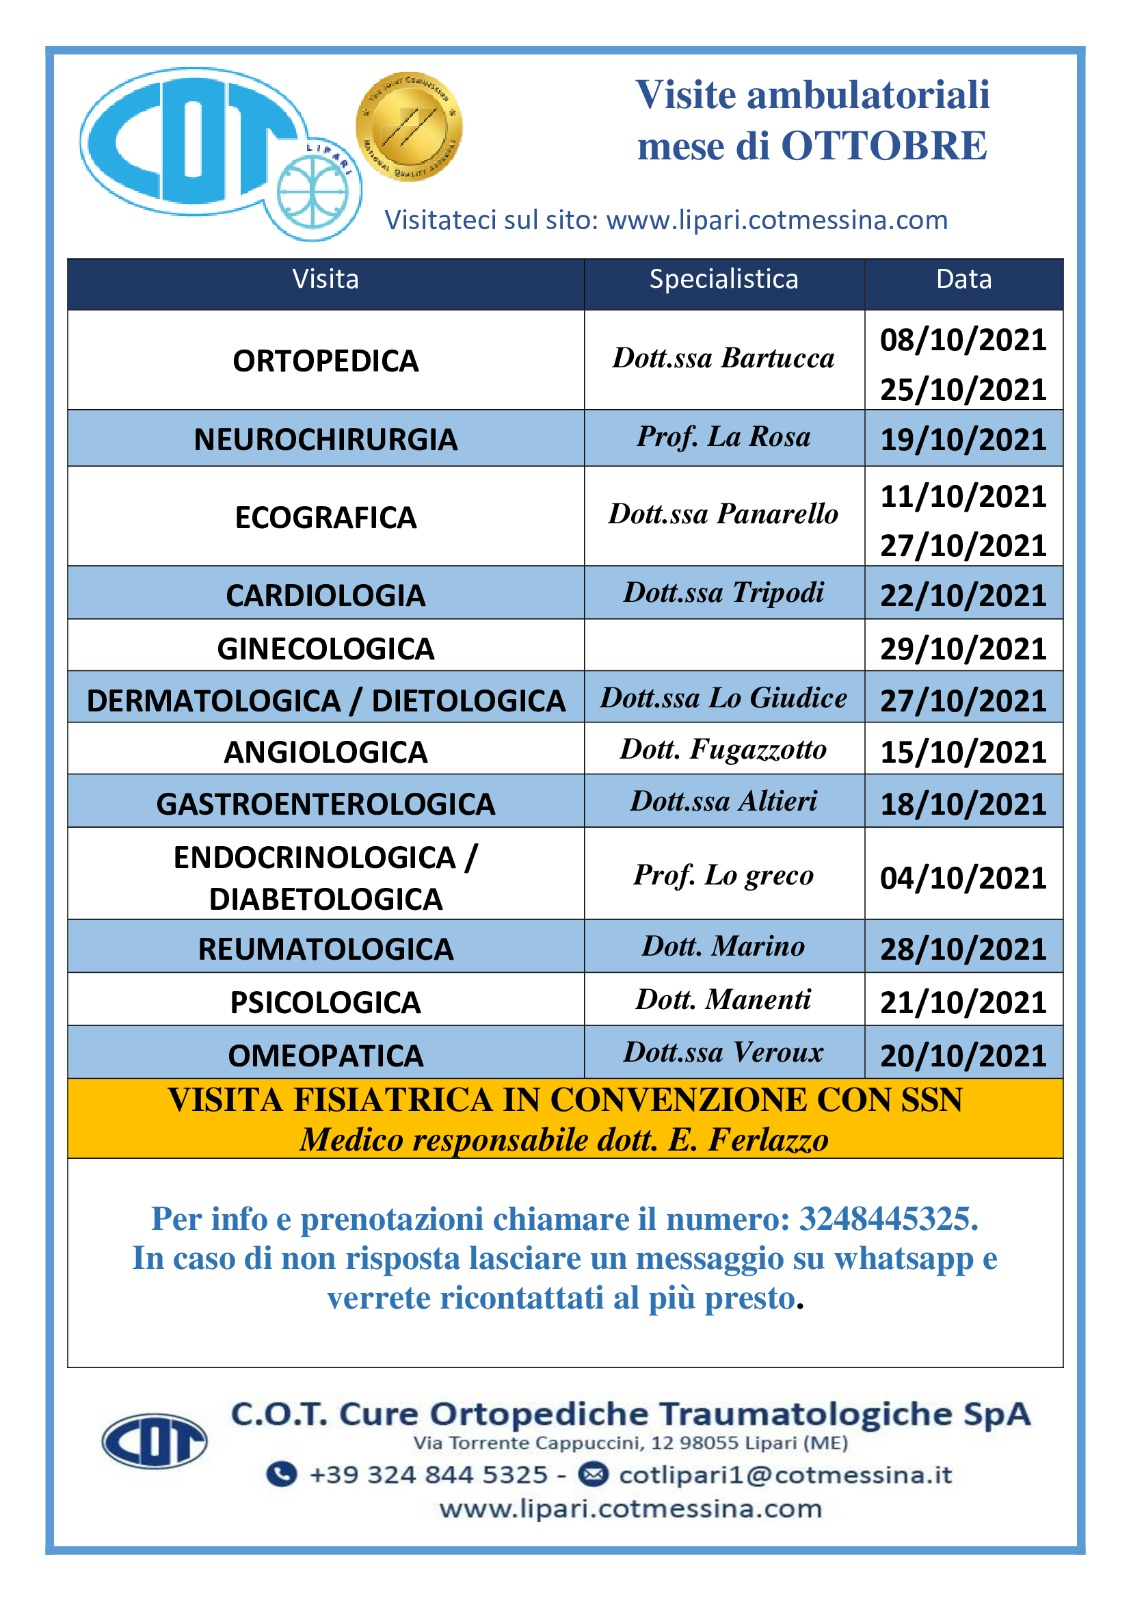 COT Lipari : Idrokinesiterapia, visite ambulatoriali di ottobre